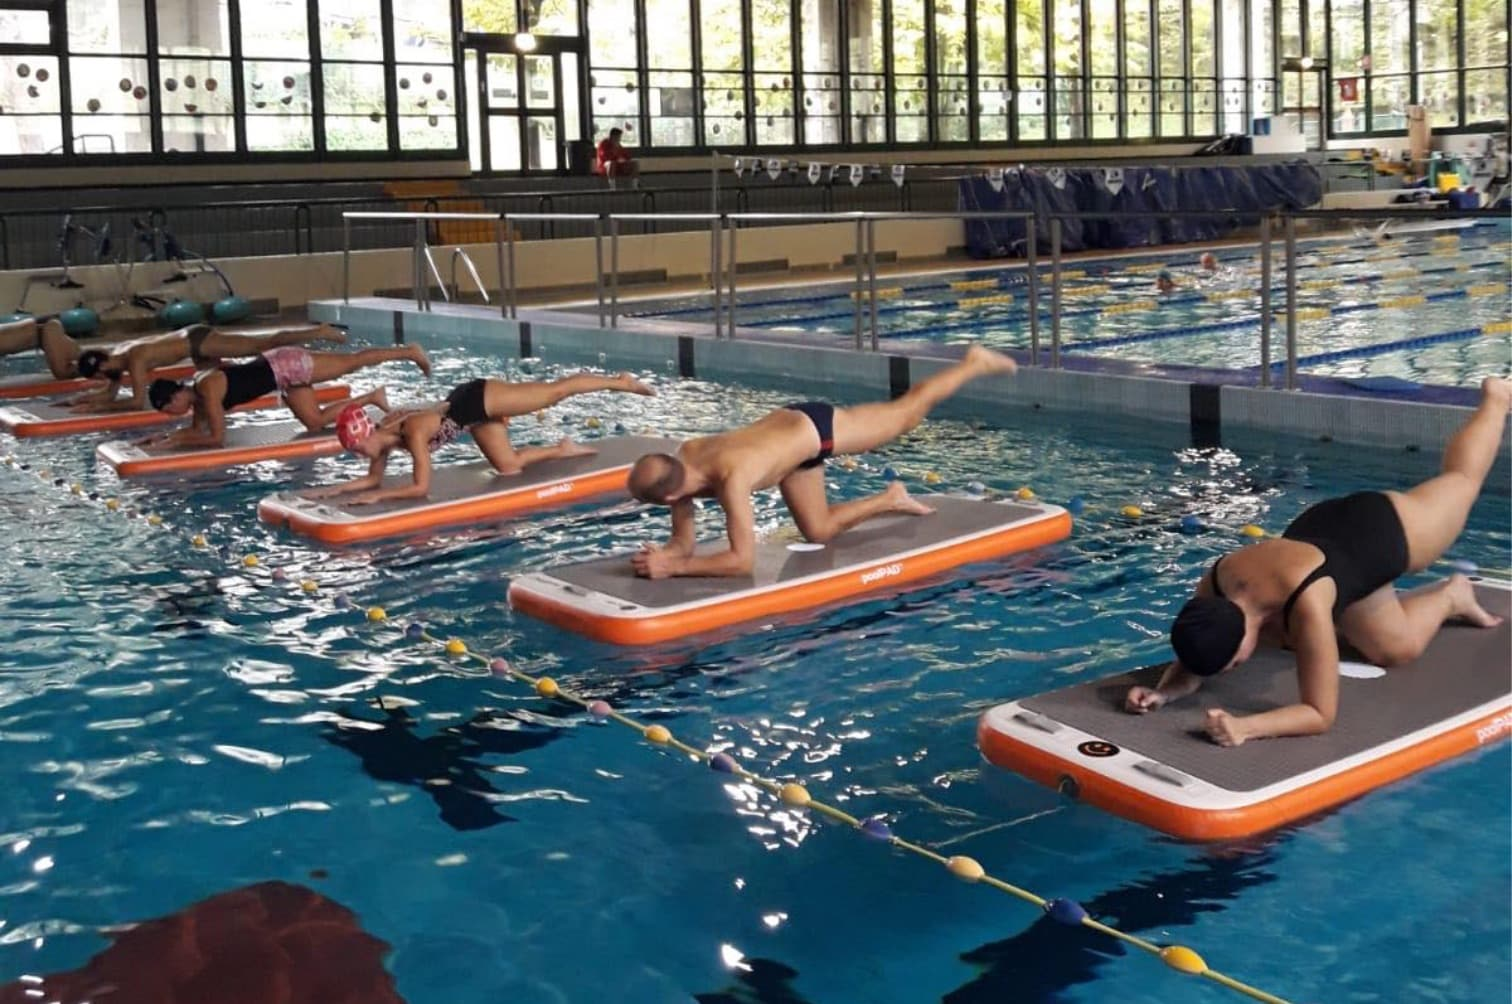 lago-figoi-corsi-fitness-acqua-pool-pad